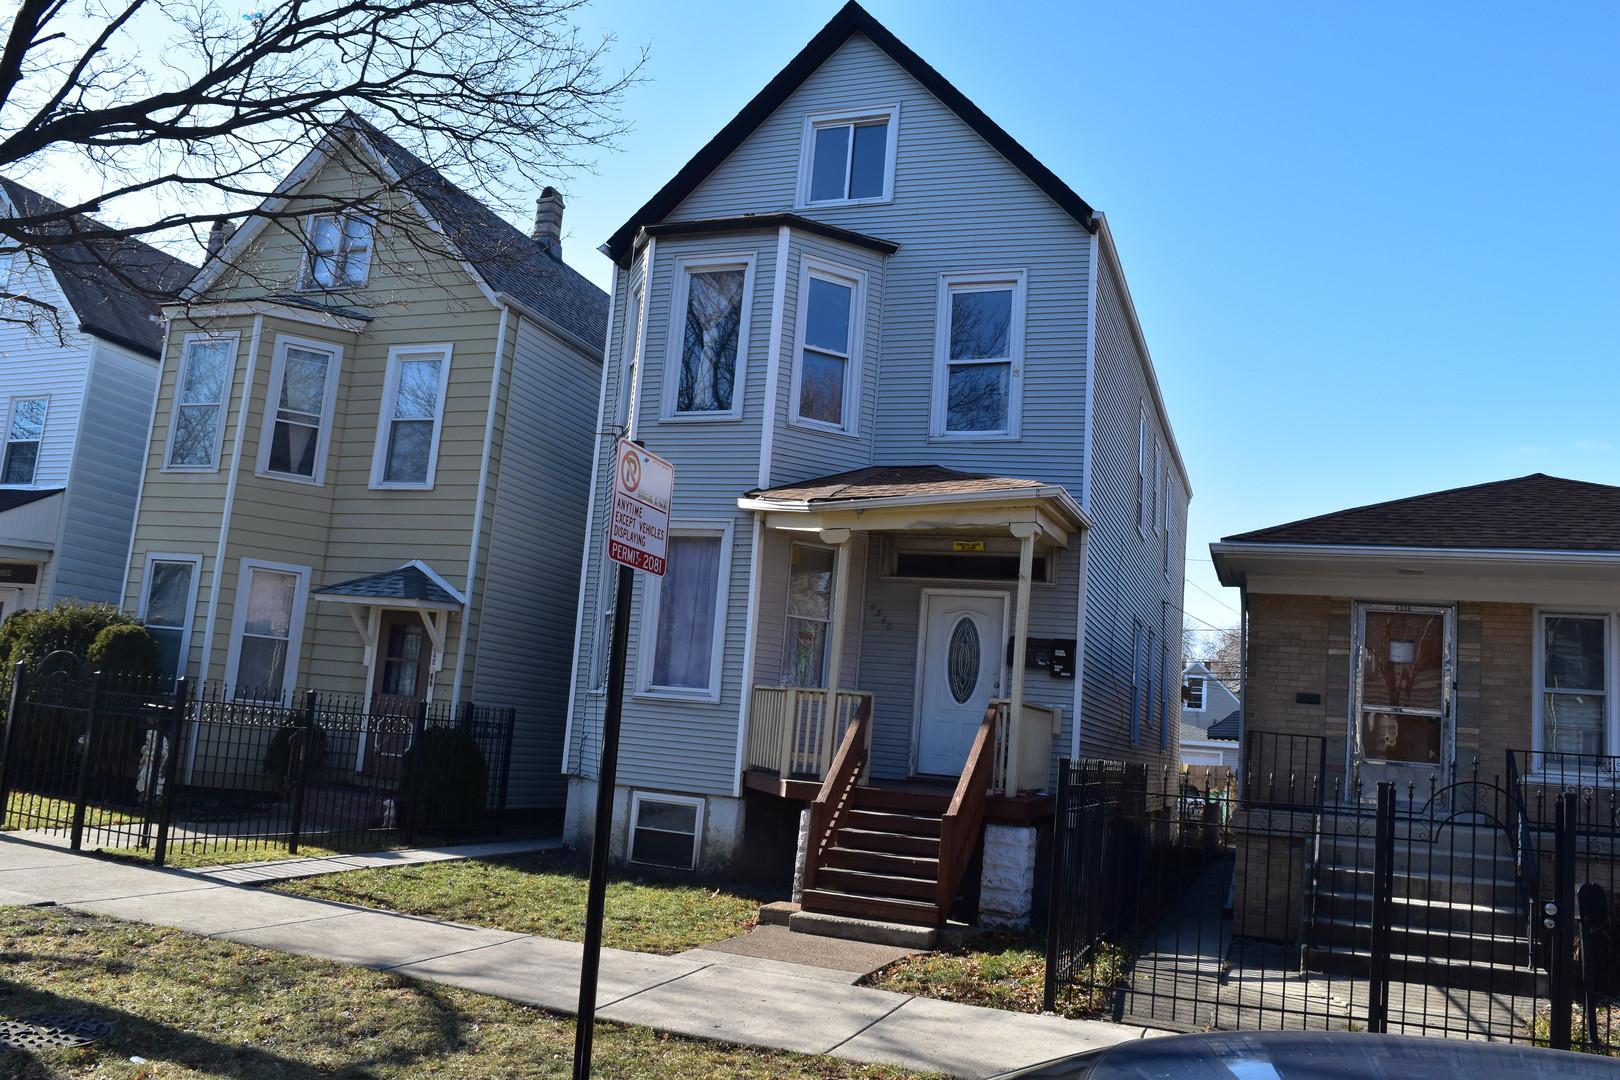 4340 South MAPLEWOOD, CHICAGO, Illinois, 60632